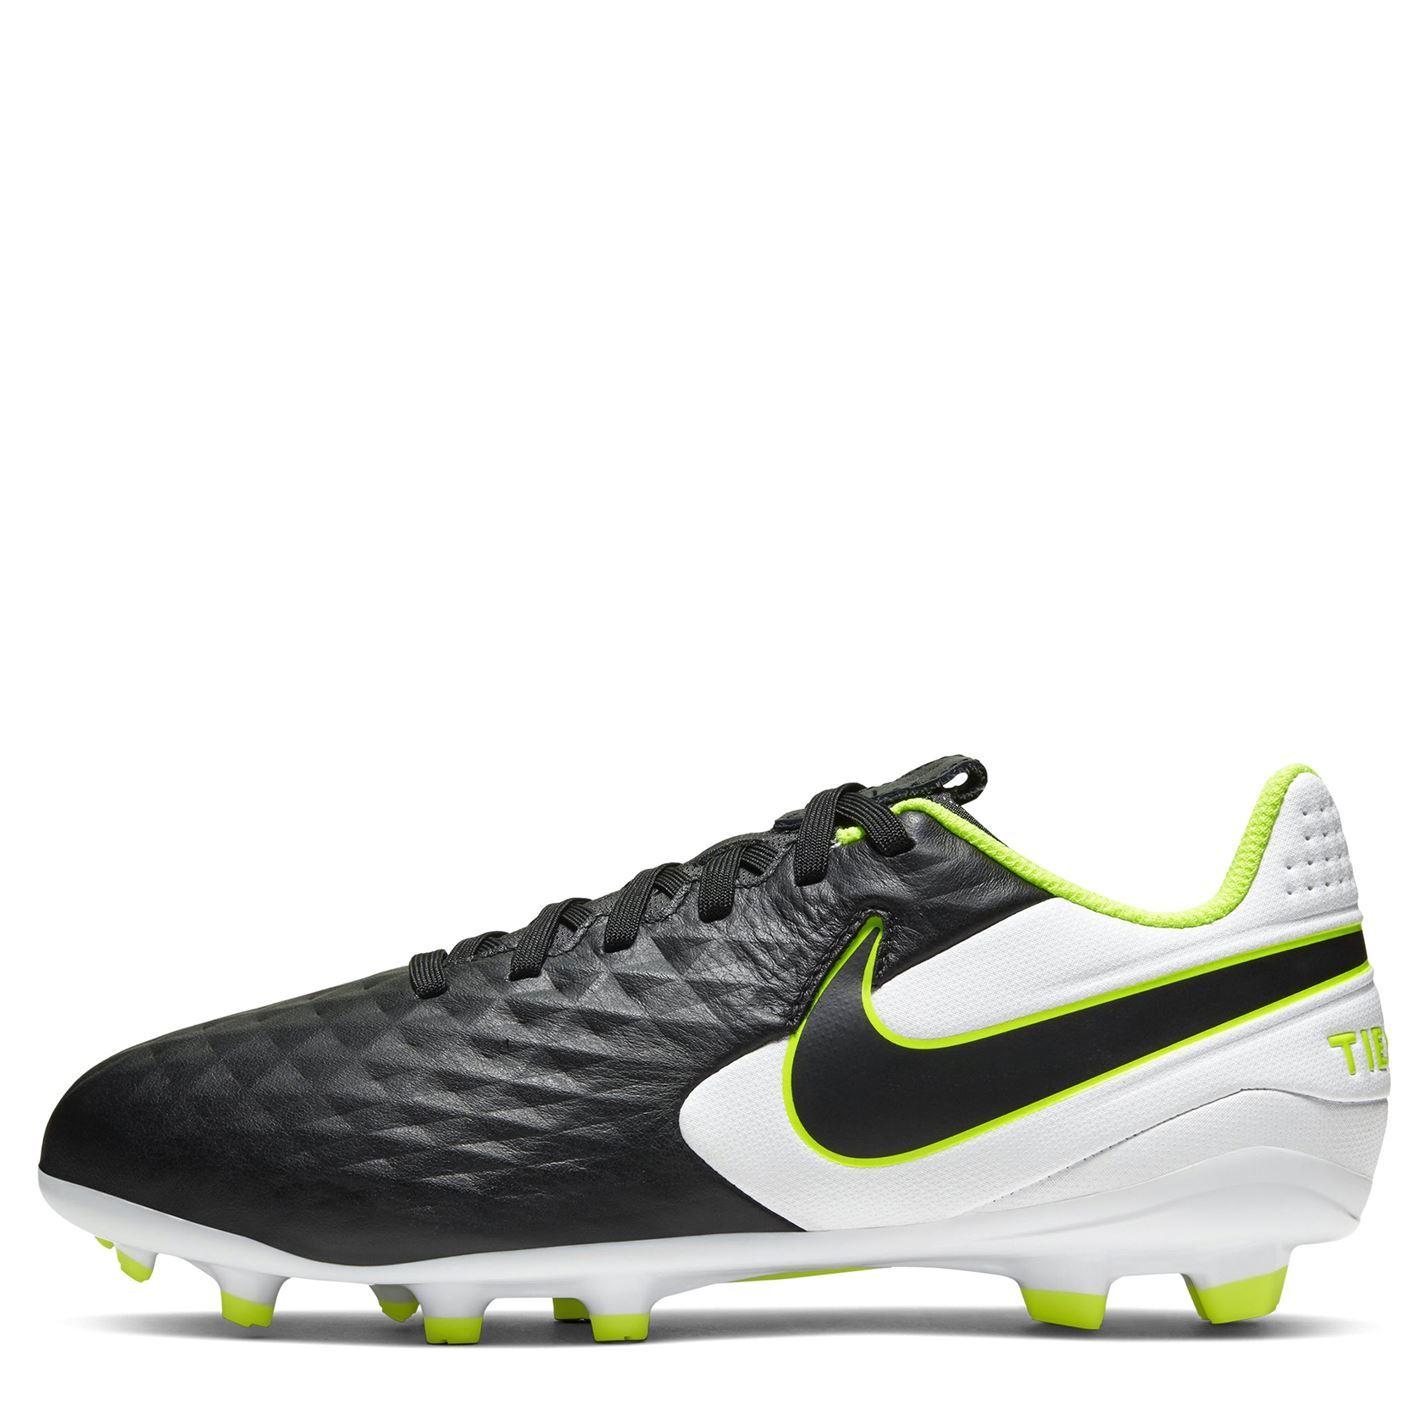 miniature 17 - Nike-Tiempo-Legend-Academy-Junior-FG-Firm-Ground-football-boots-Boys-Football